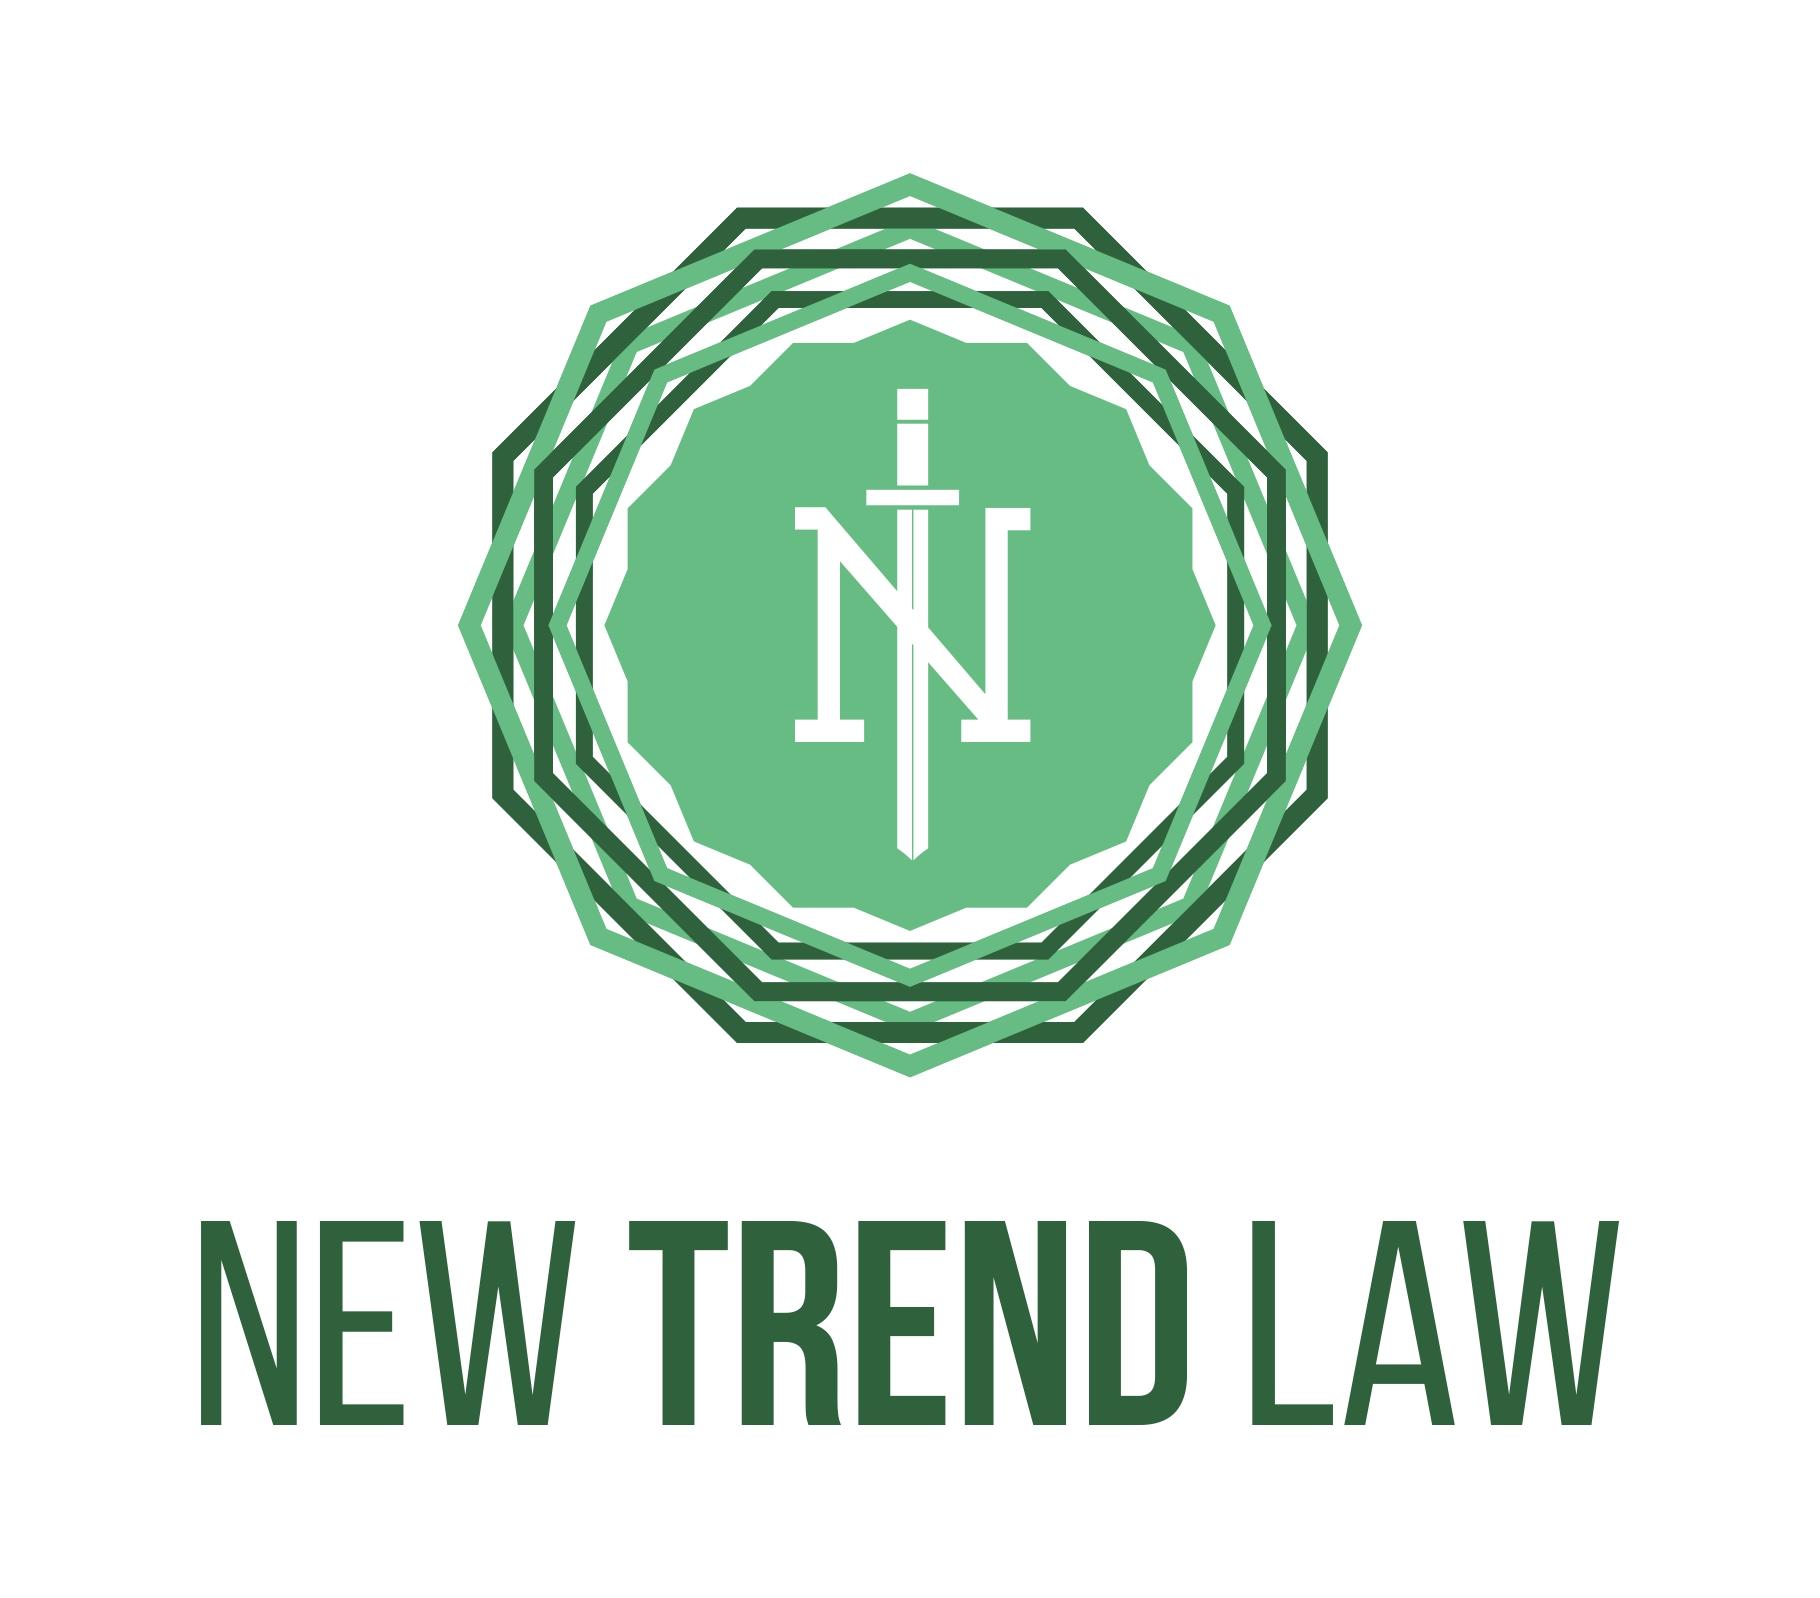 Logotipo New Trend Law